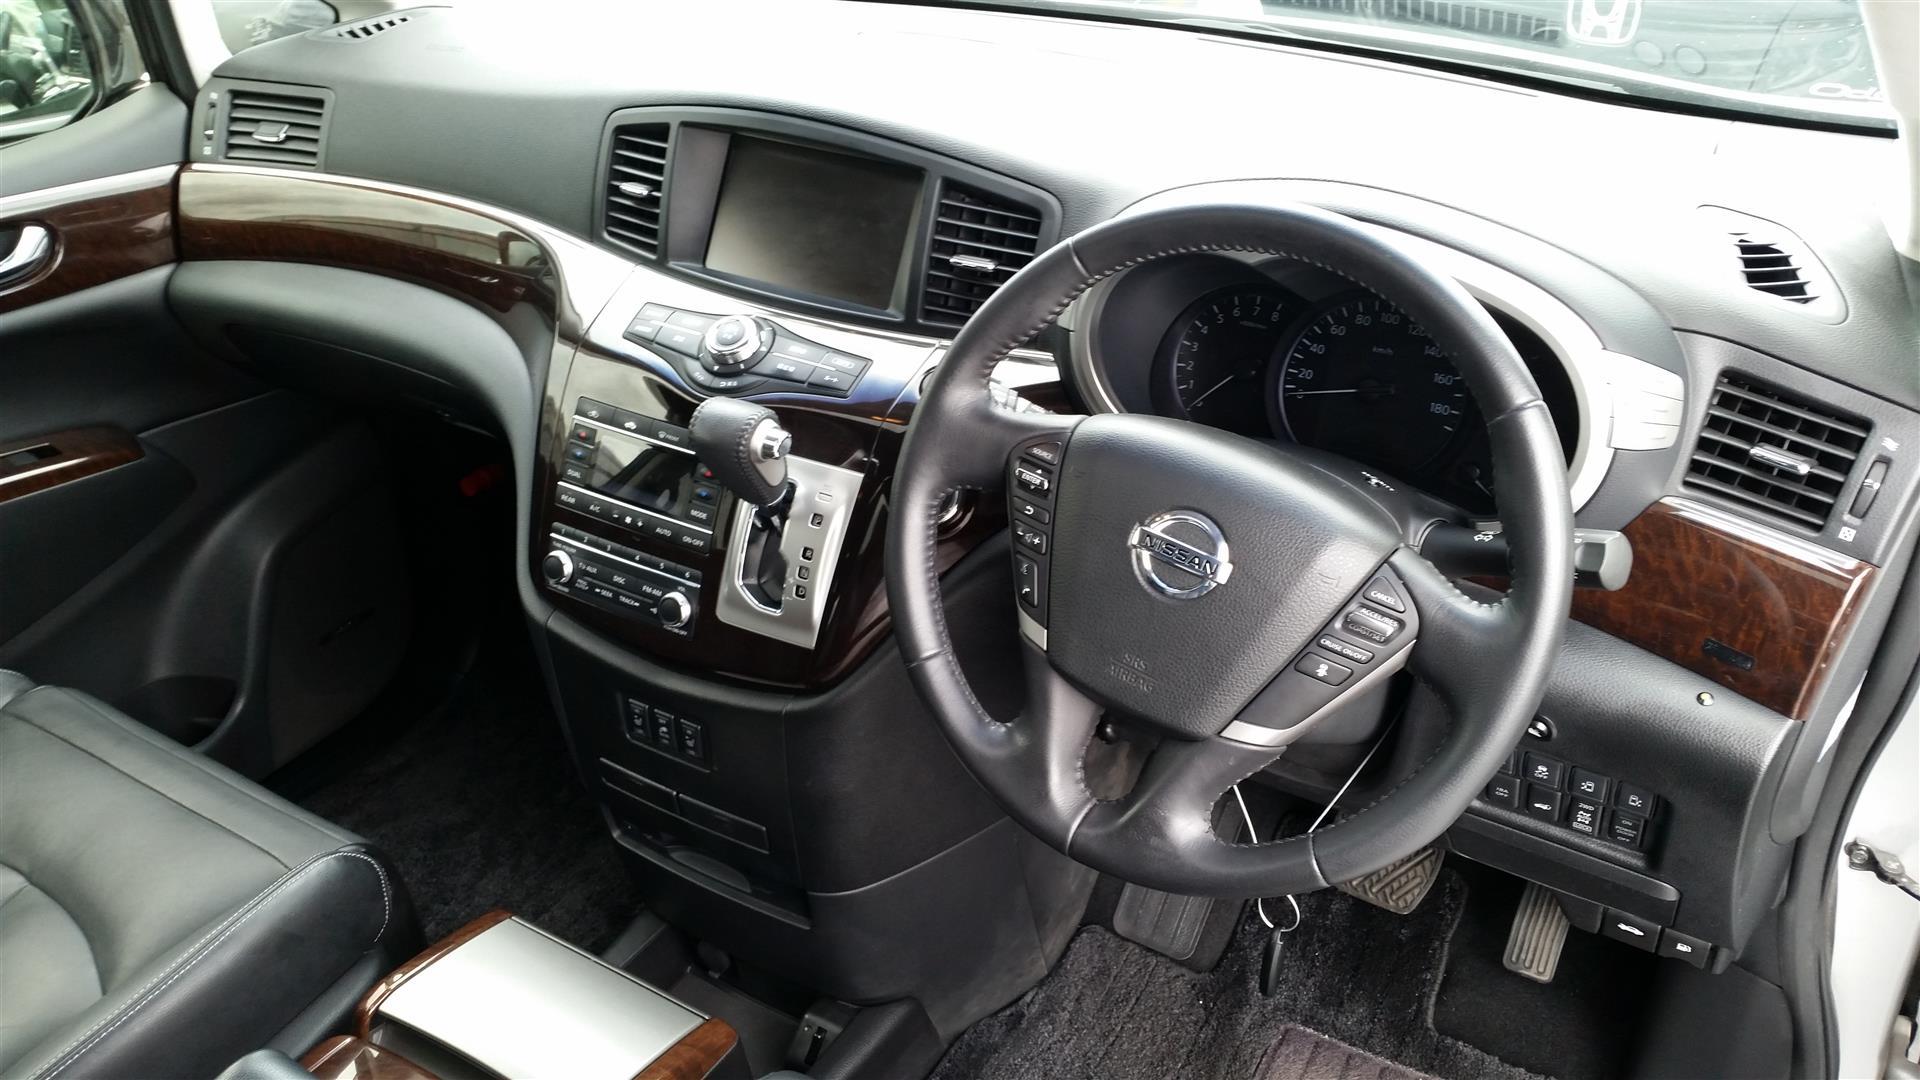 2012 Nissan Elgrand E52 20150627_143247 (Large)